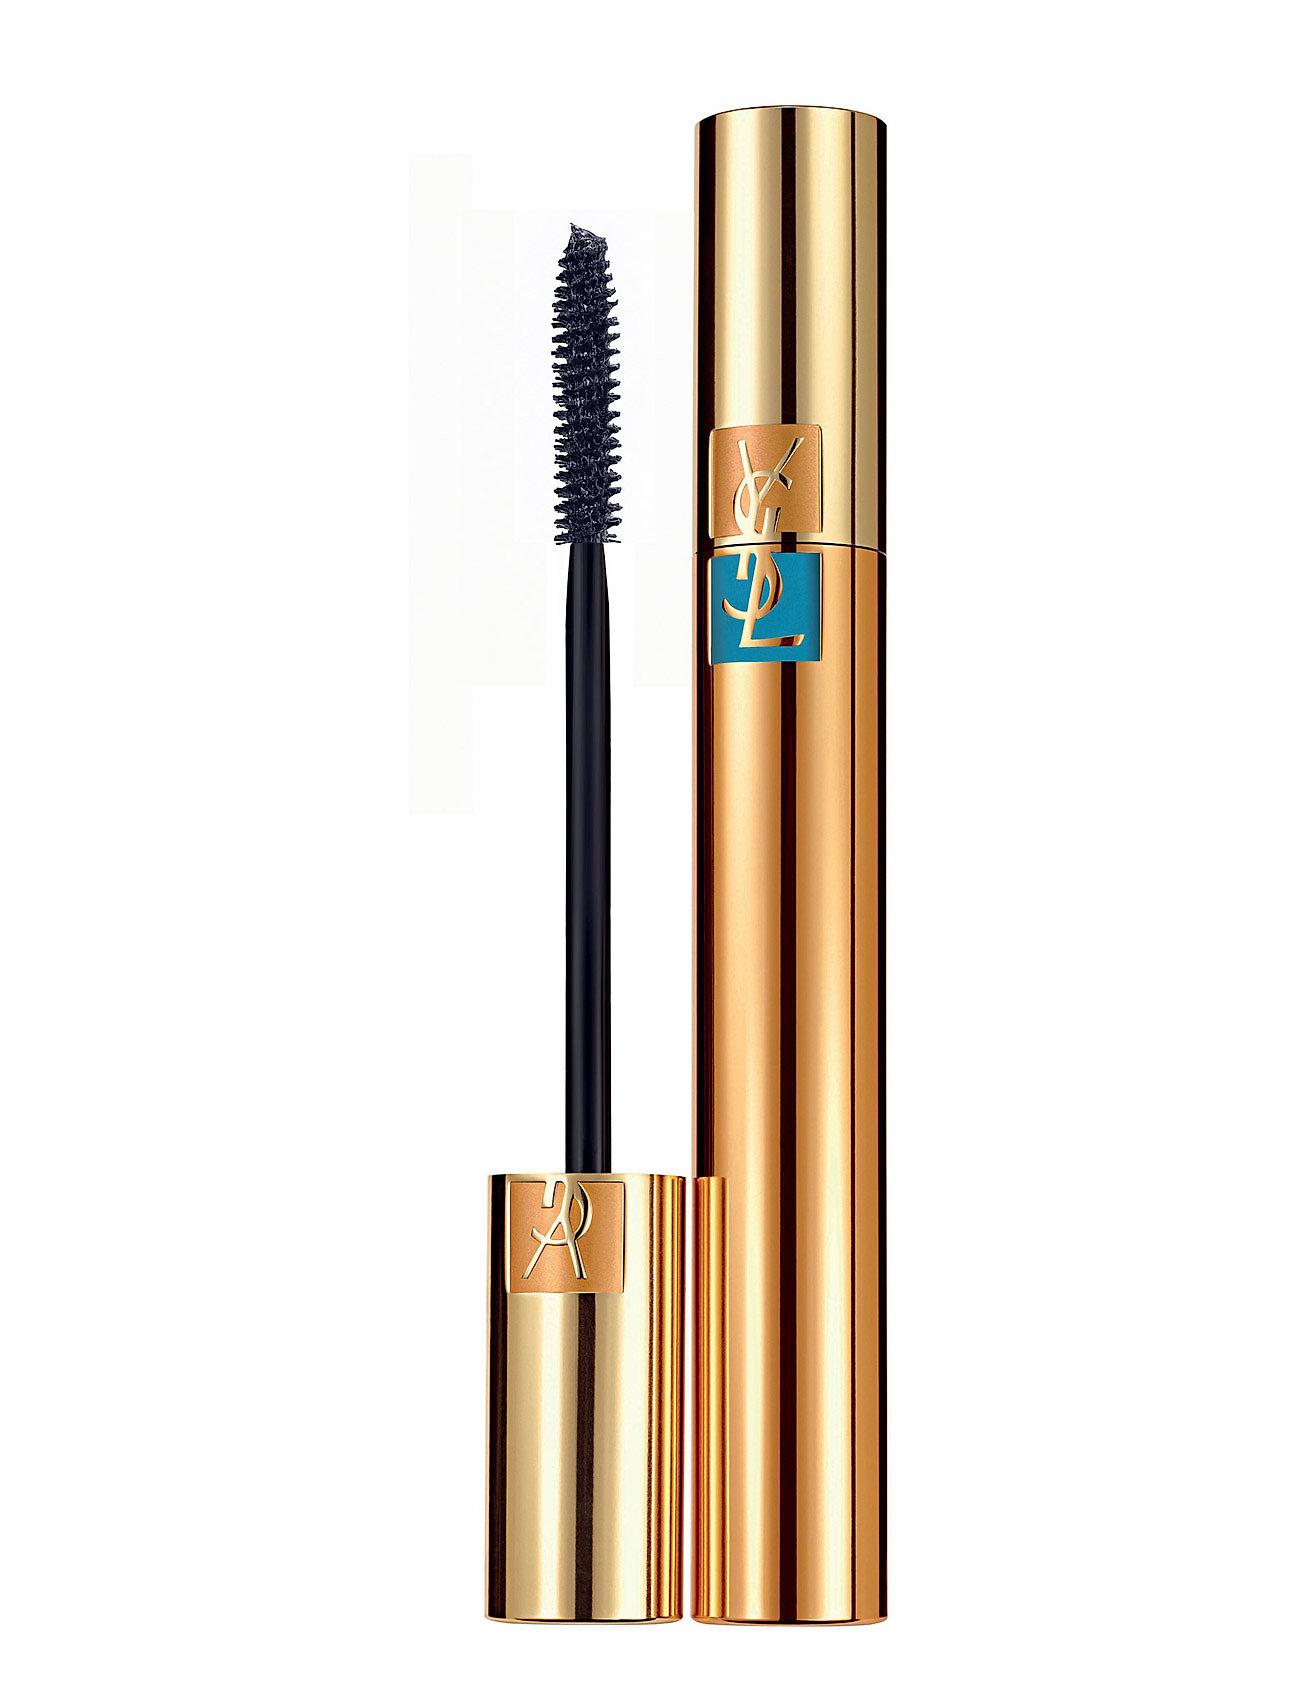 yves saint laurent – Mascara volume effect faux cils waterproof waterproof 1 char på boozt.com dk